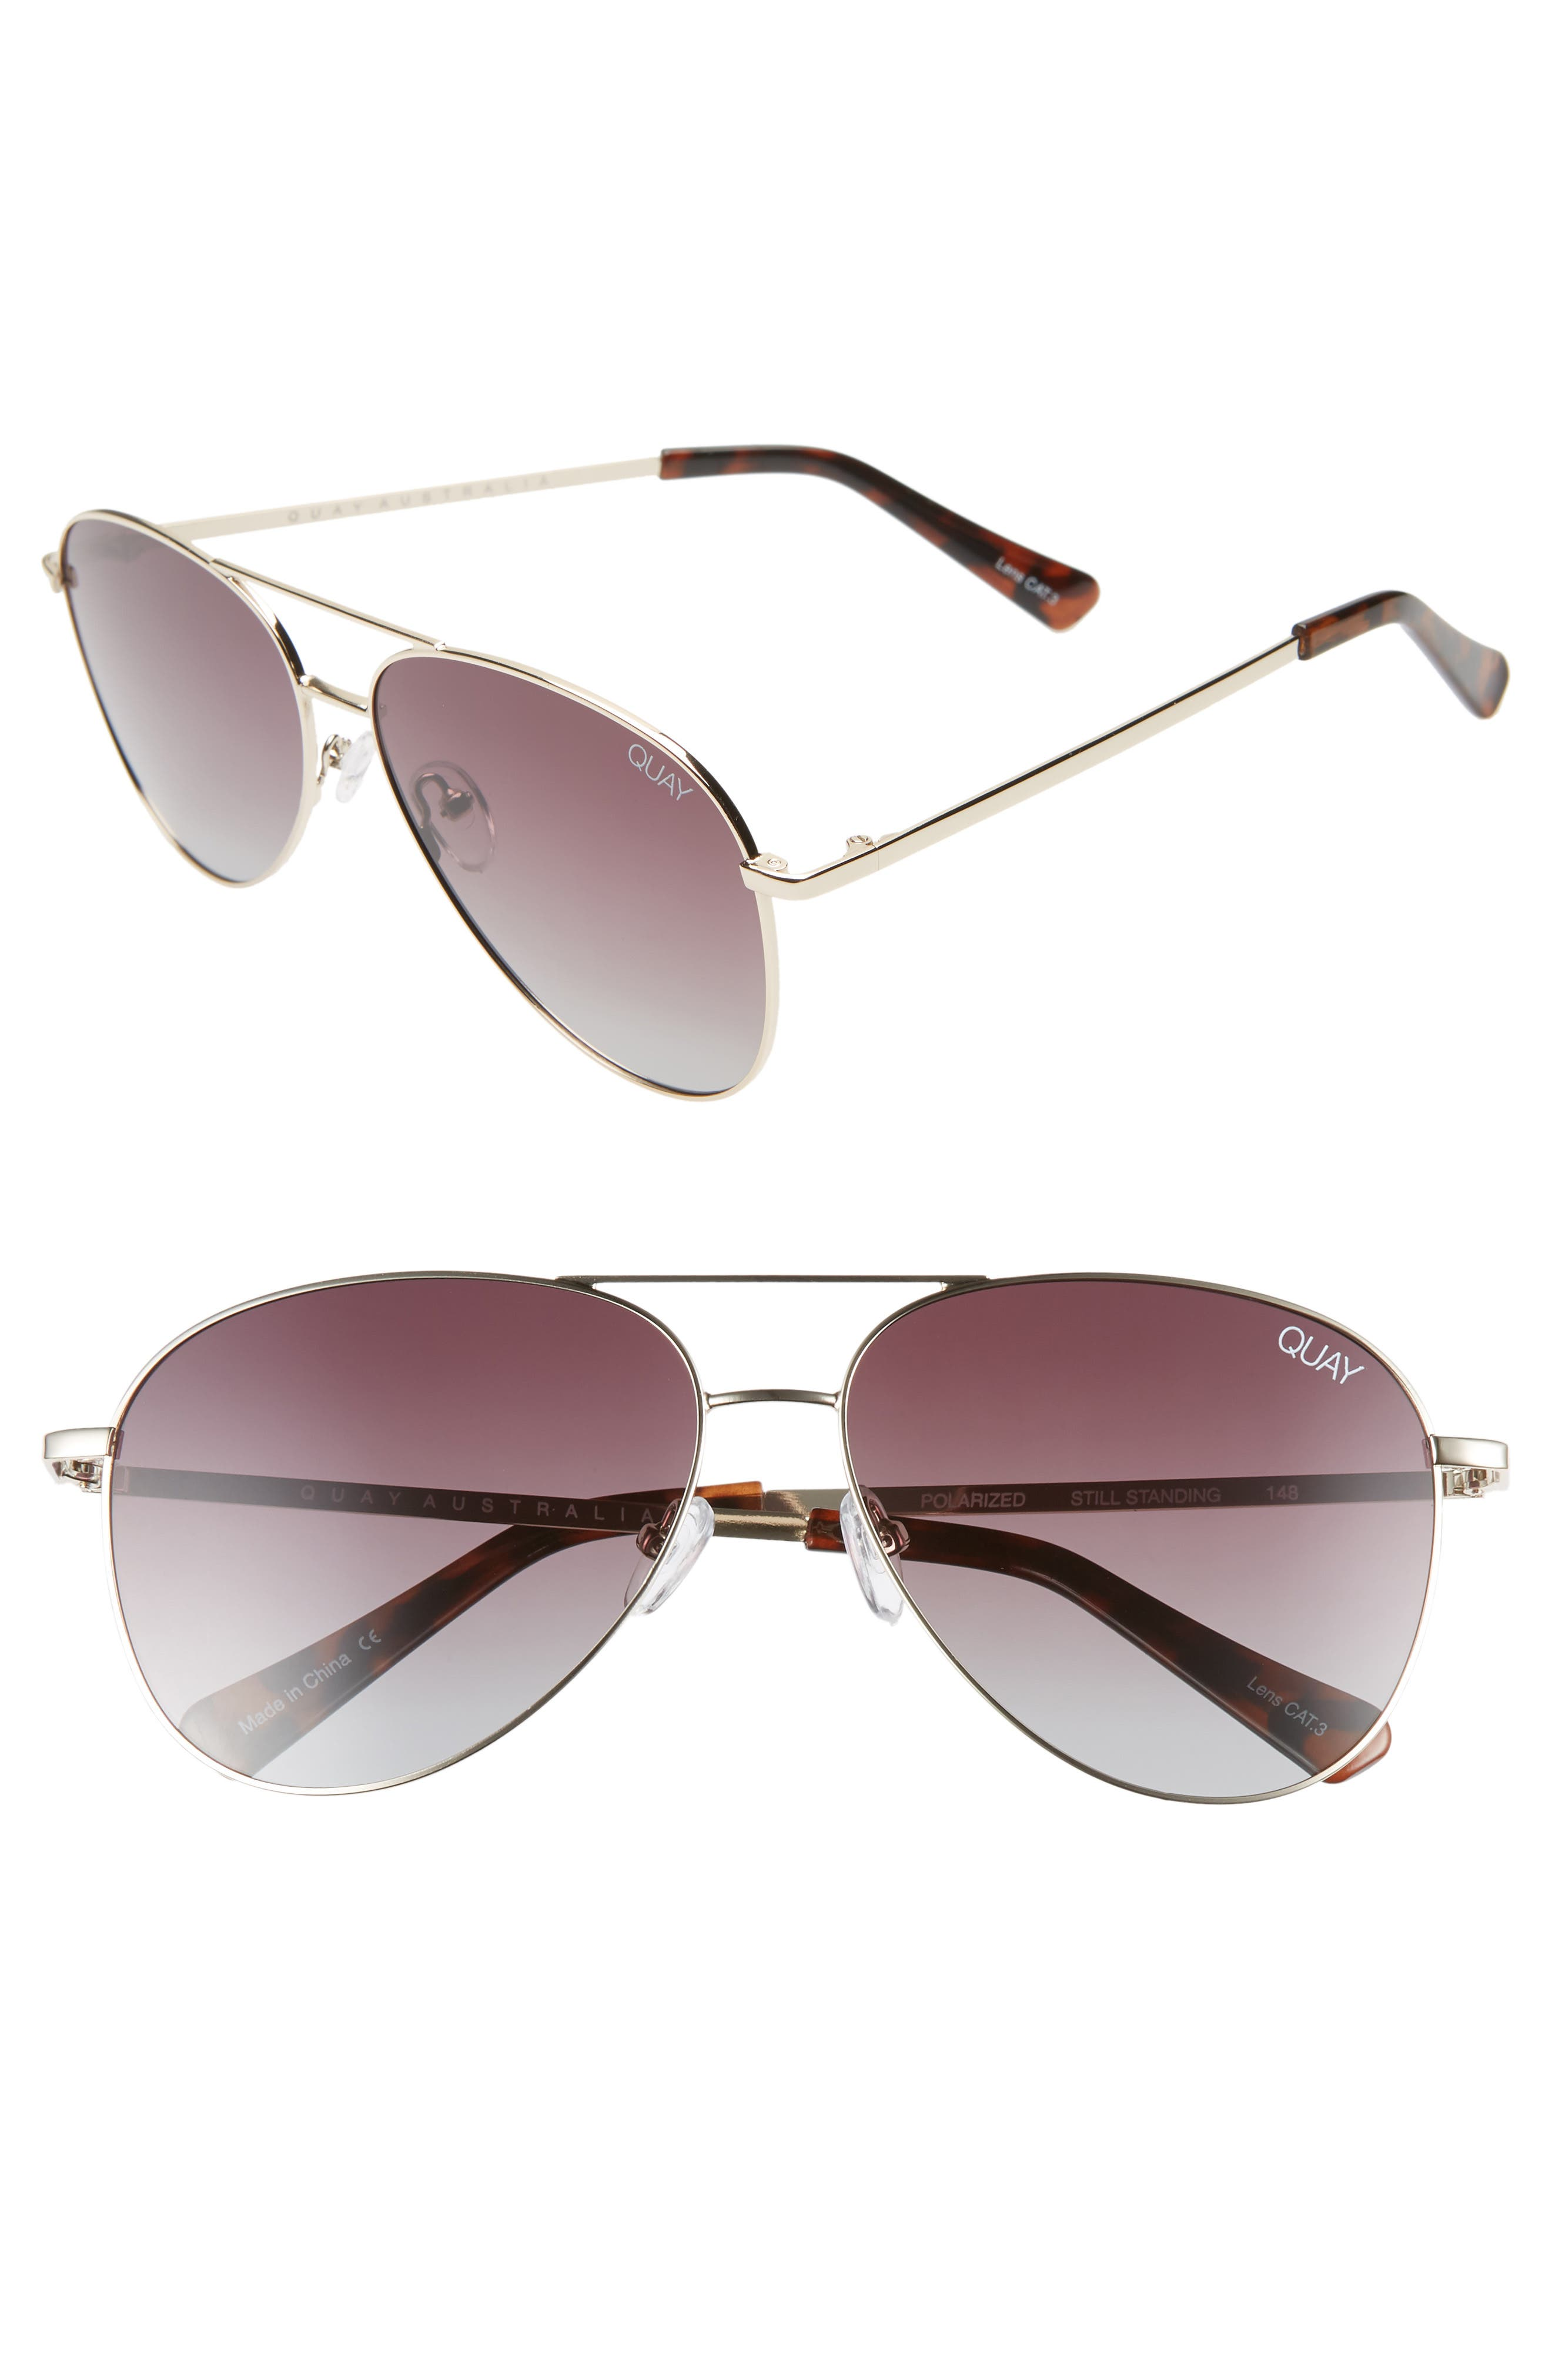 0f101ab1b1 Men s Quay Australia Sunglasses   Eyeglasses